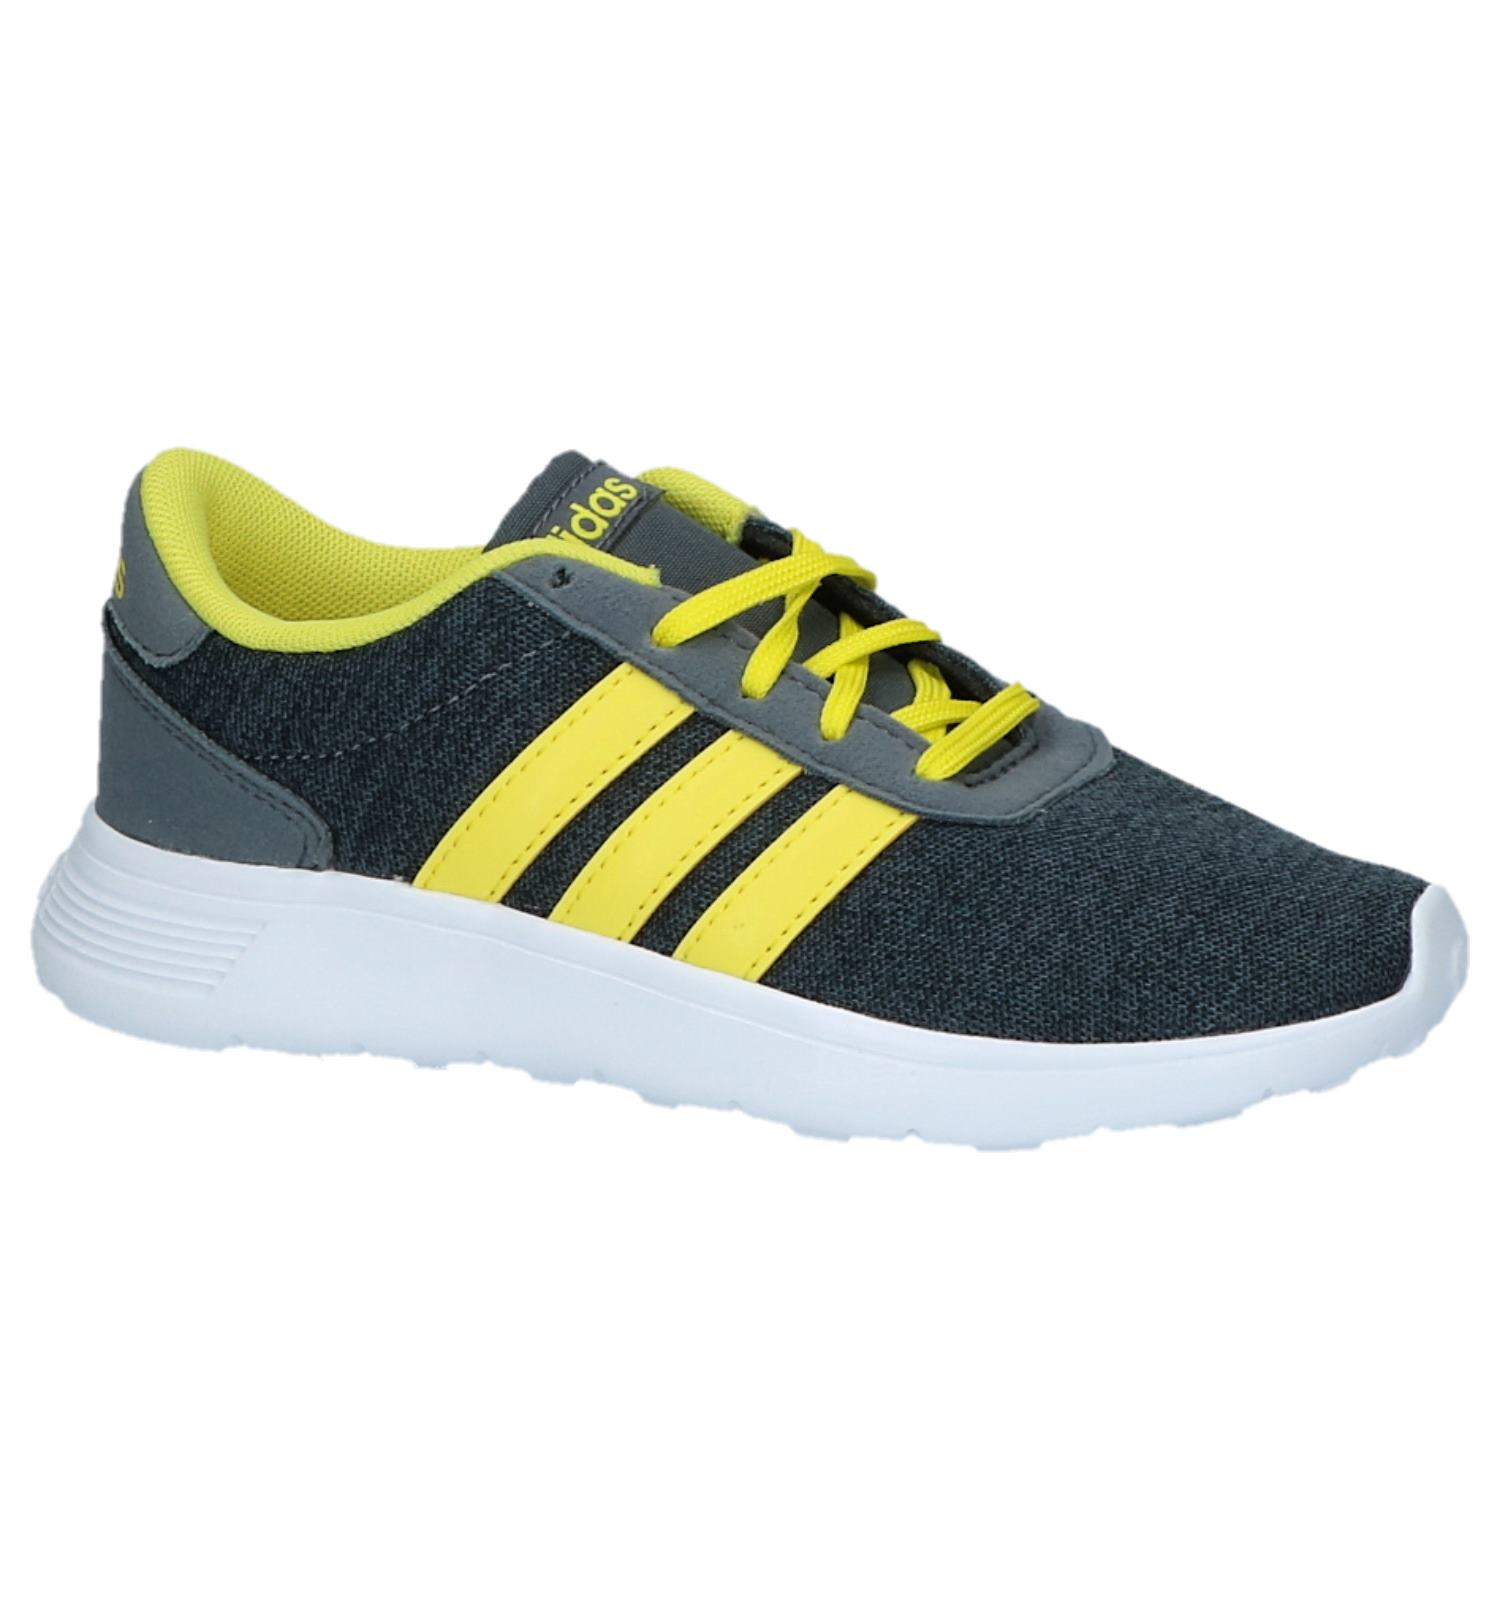 220798193bd adidas Lite Racer K Grijze Sneakers   TORFS.BE   Gratis verzend en retour